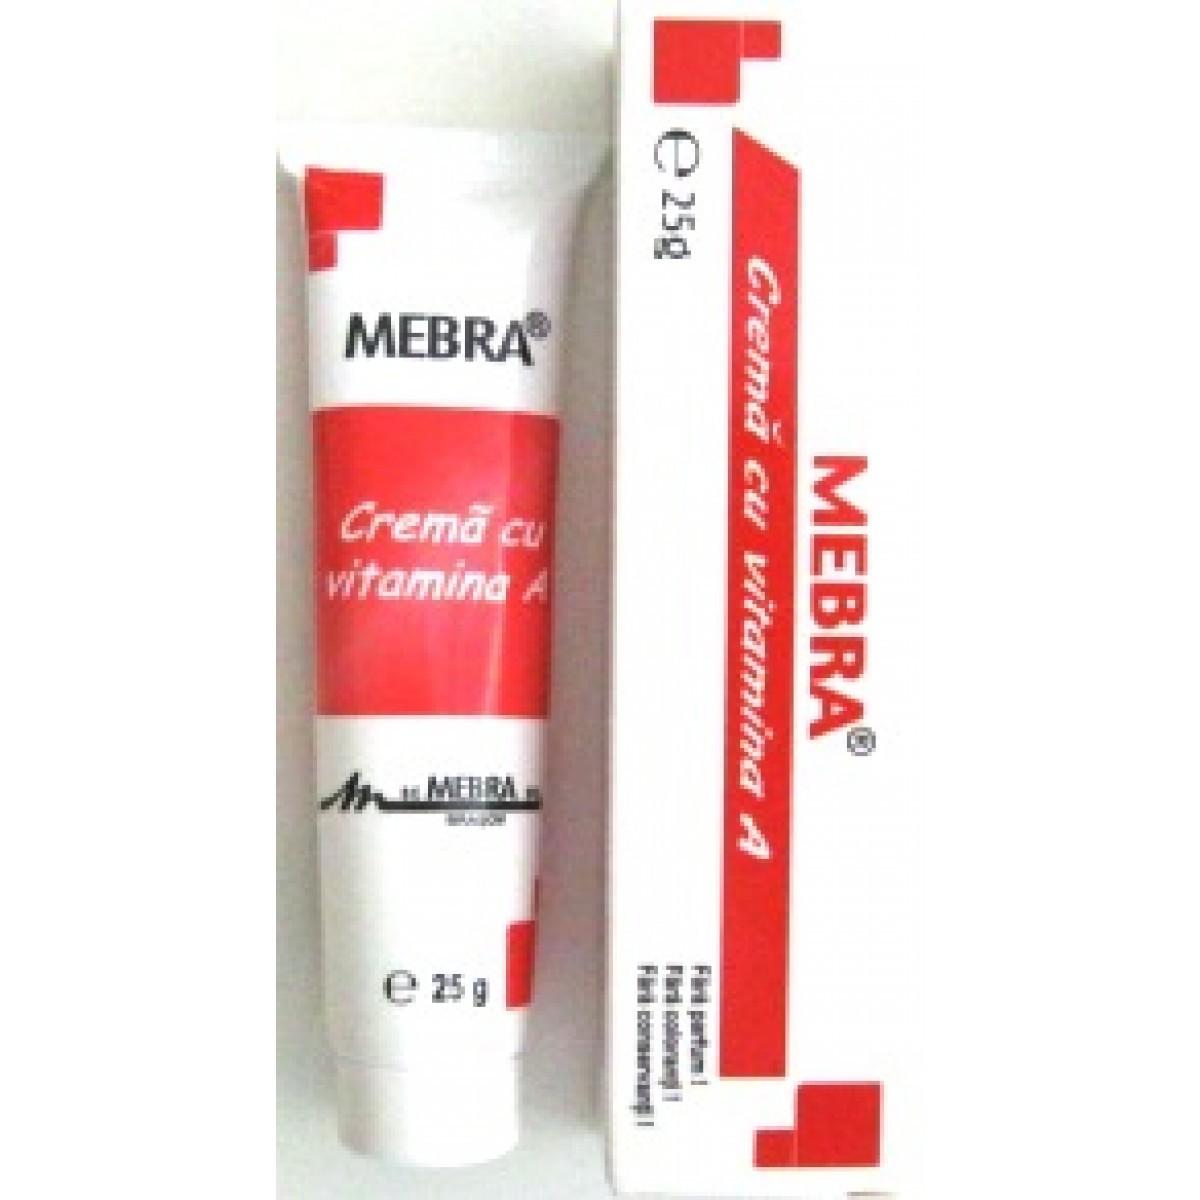 https://images.bonanzastatic.com/afu/images/3075/5426/26/Cream_retinol__retinol-A___vitamin_A.jpg